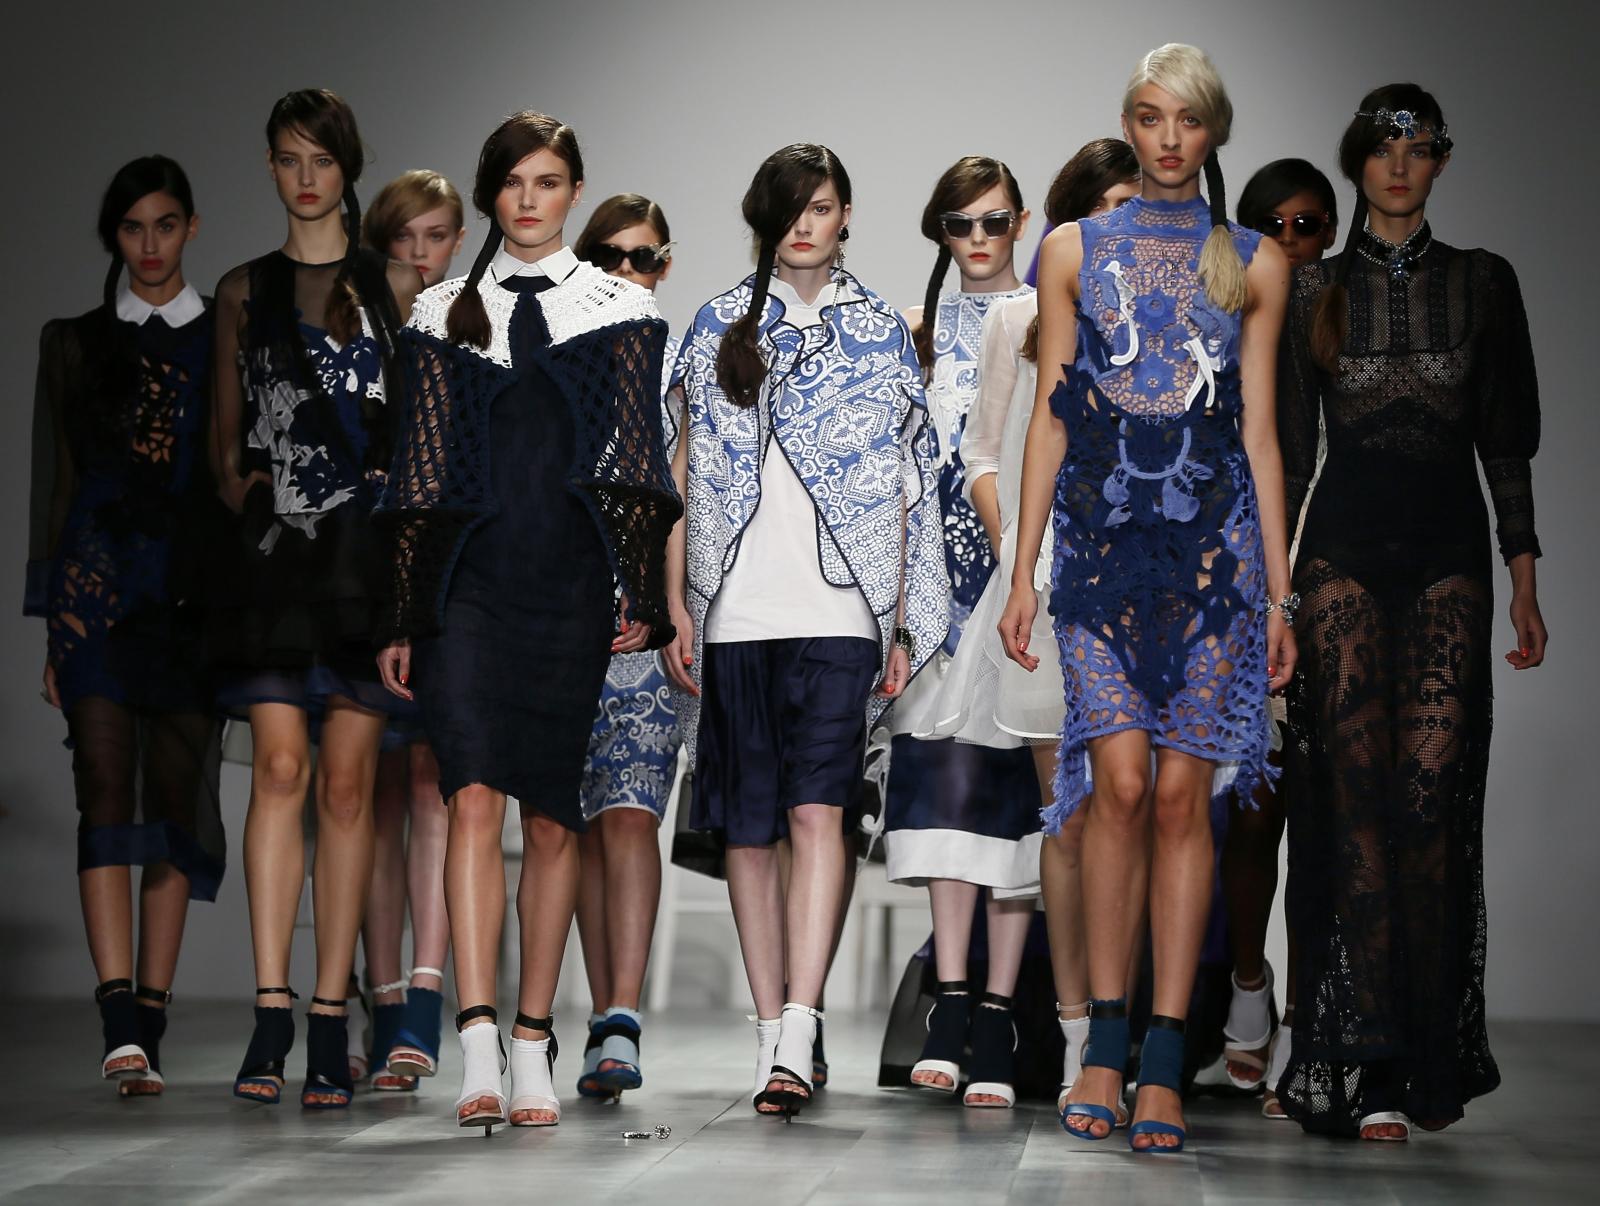 London Fashion Week - Day 1 - 01